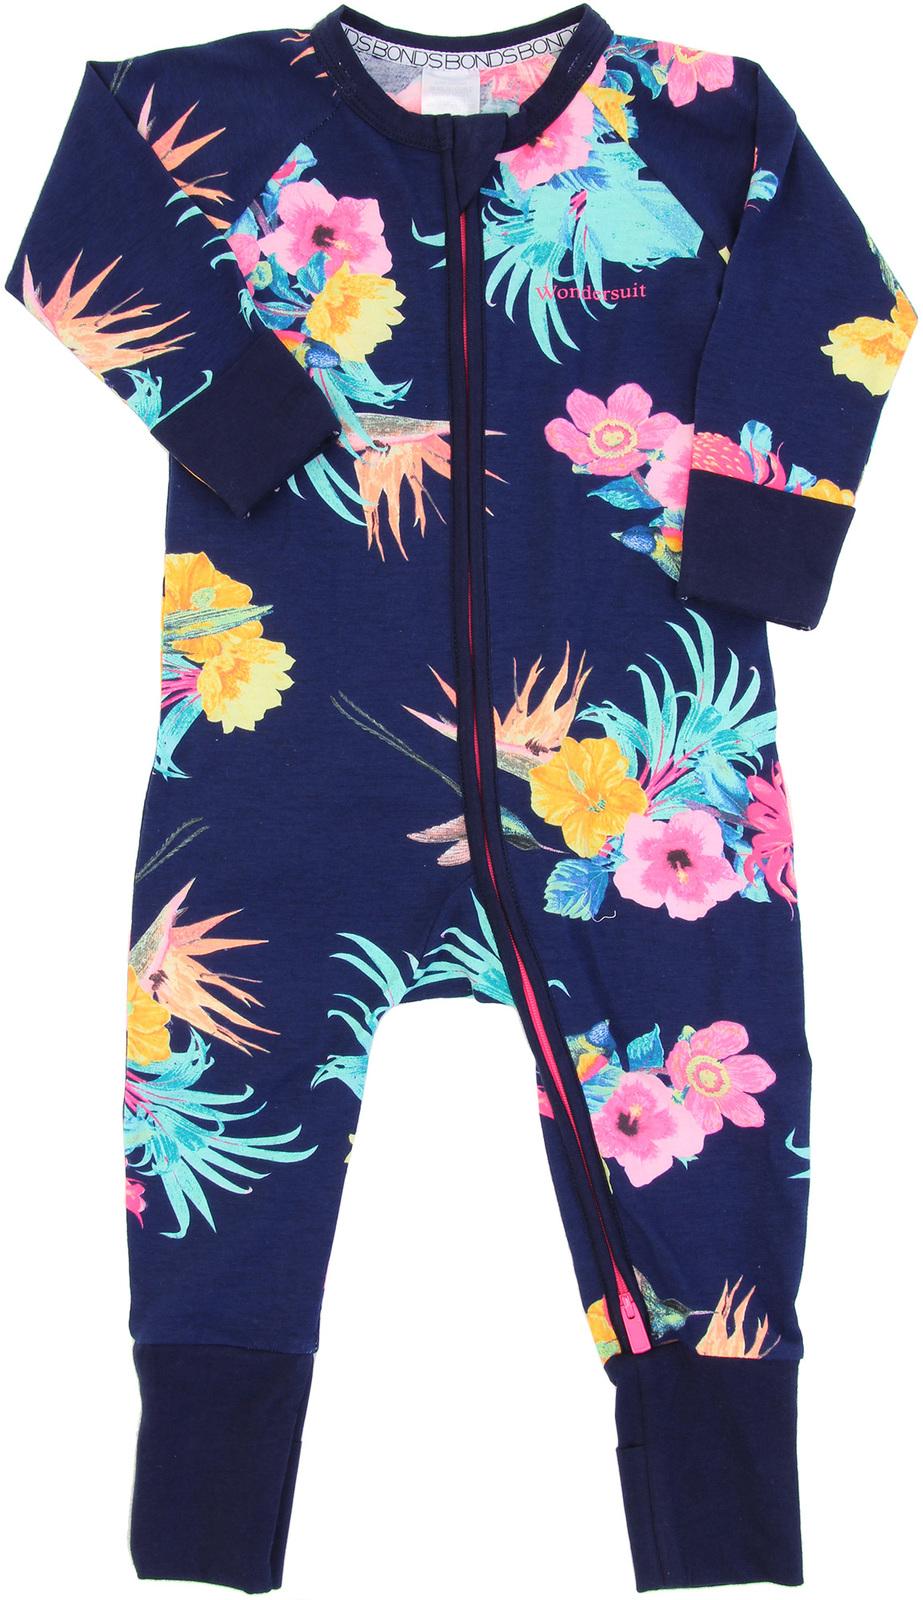 Bonds Zip Wondersuit Long Sleeve - Coolangatta Kids Deep Arctic - 6-12 Months image